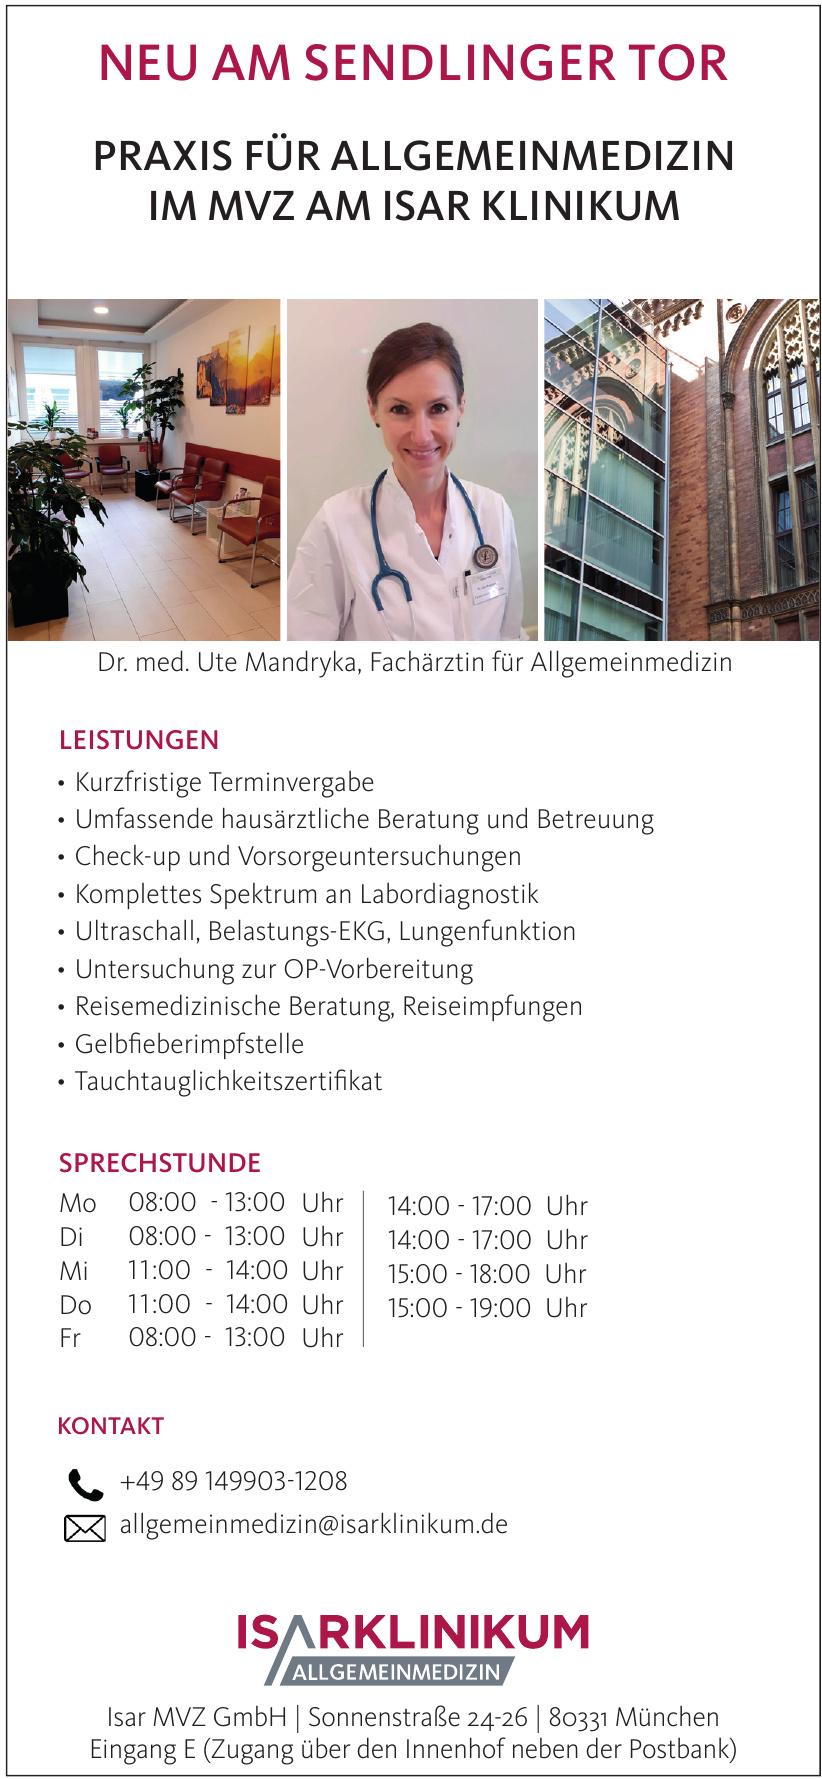 Isar MVZ GmbH